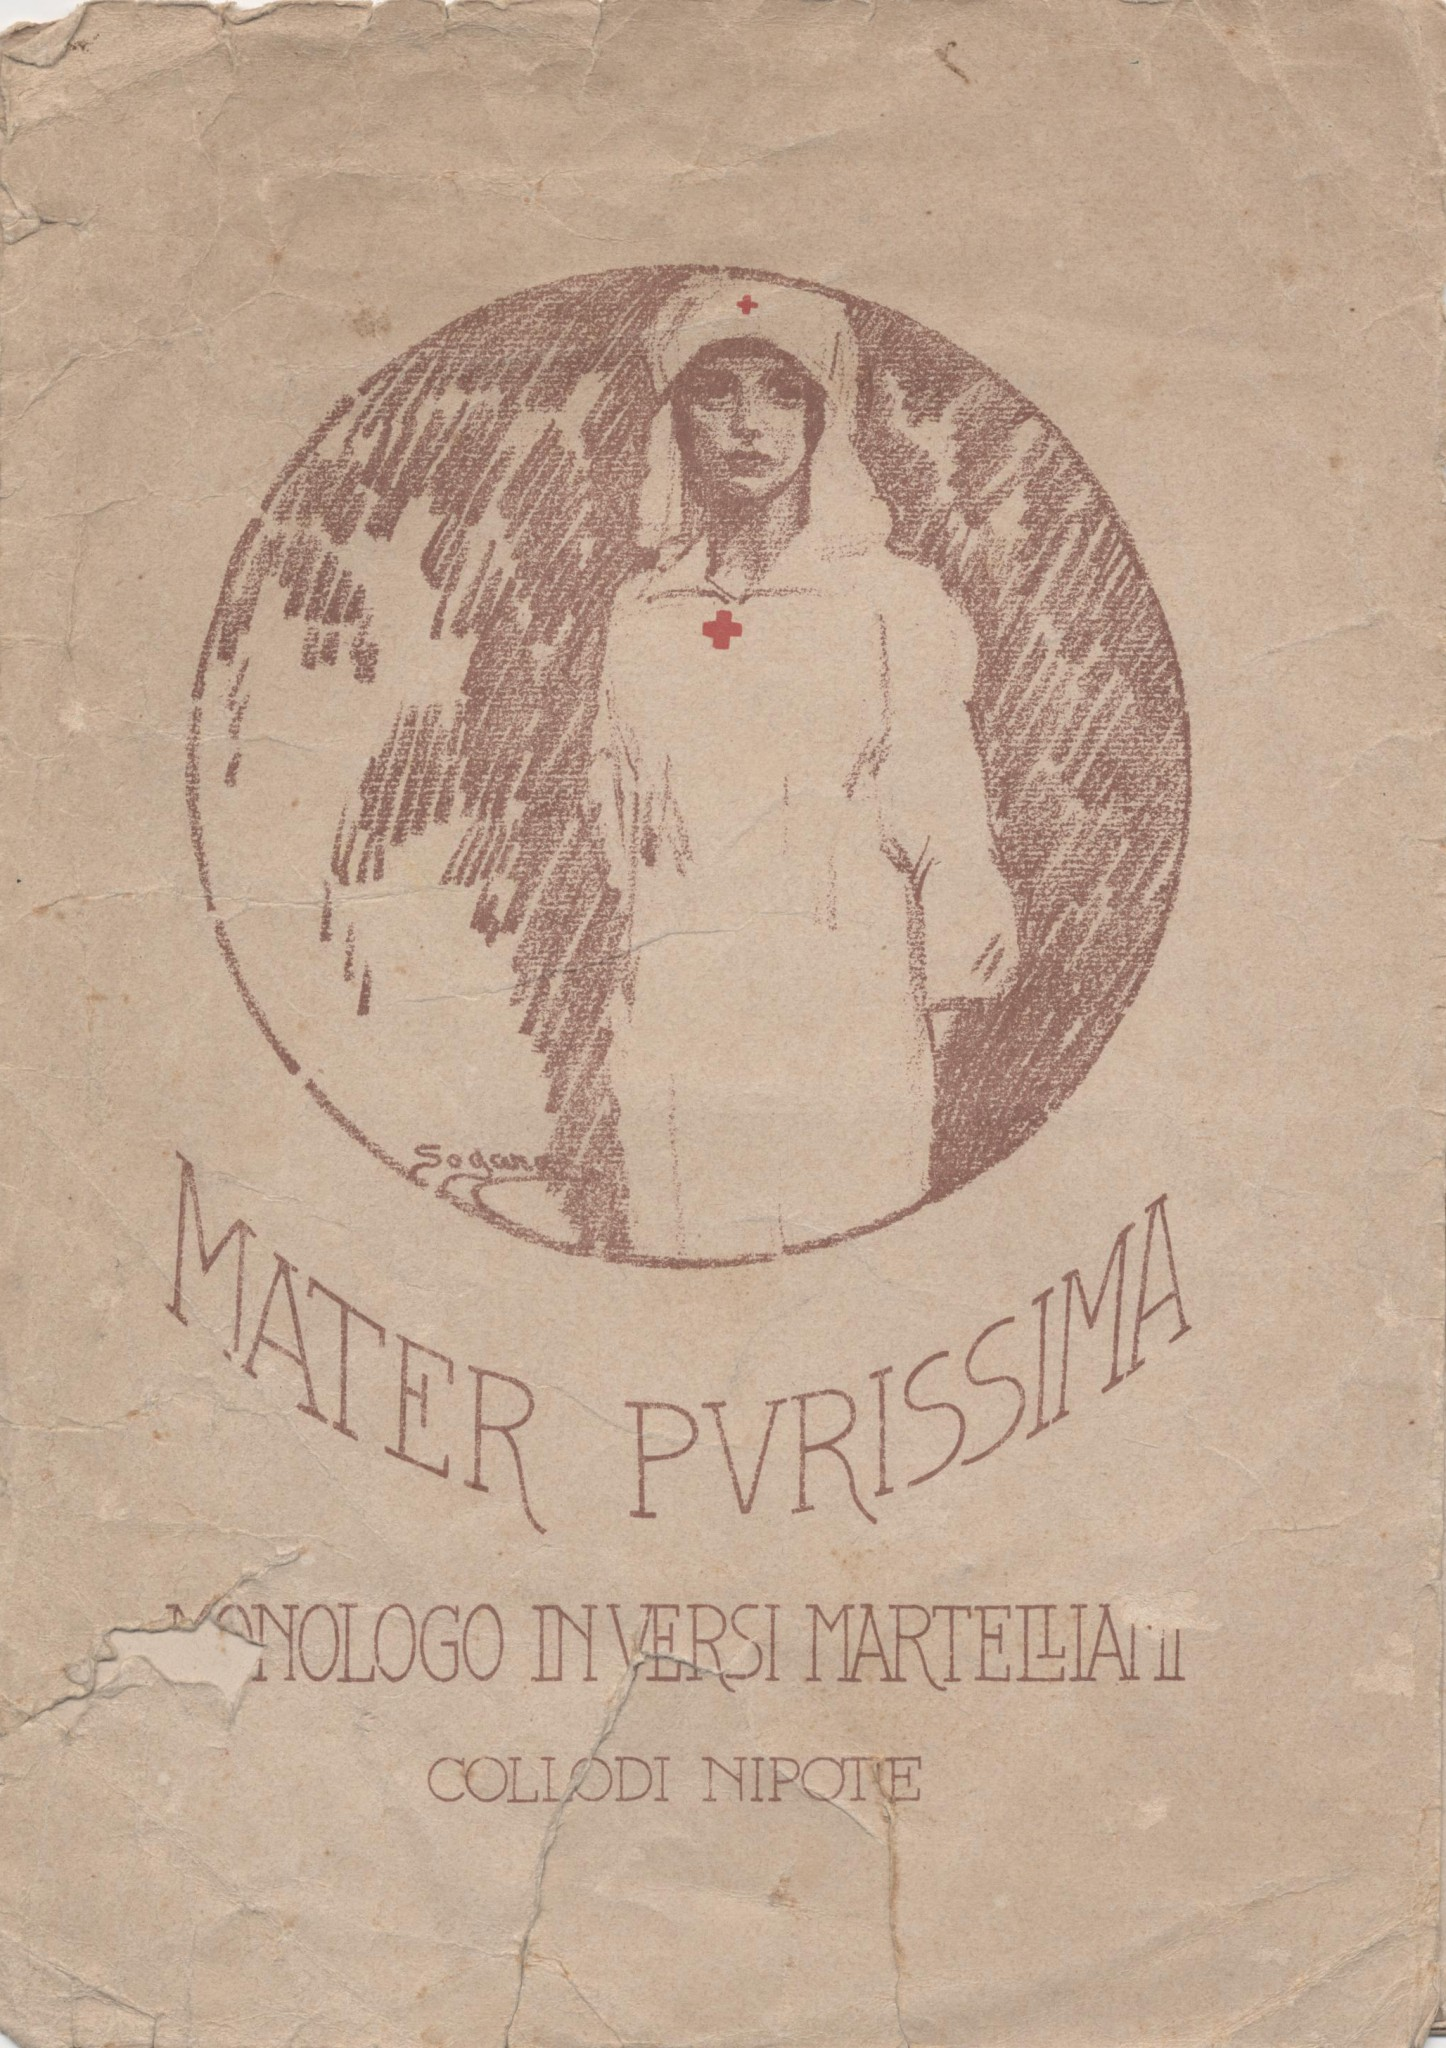 mater purissima